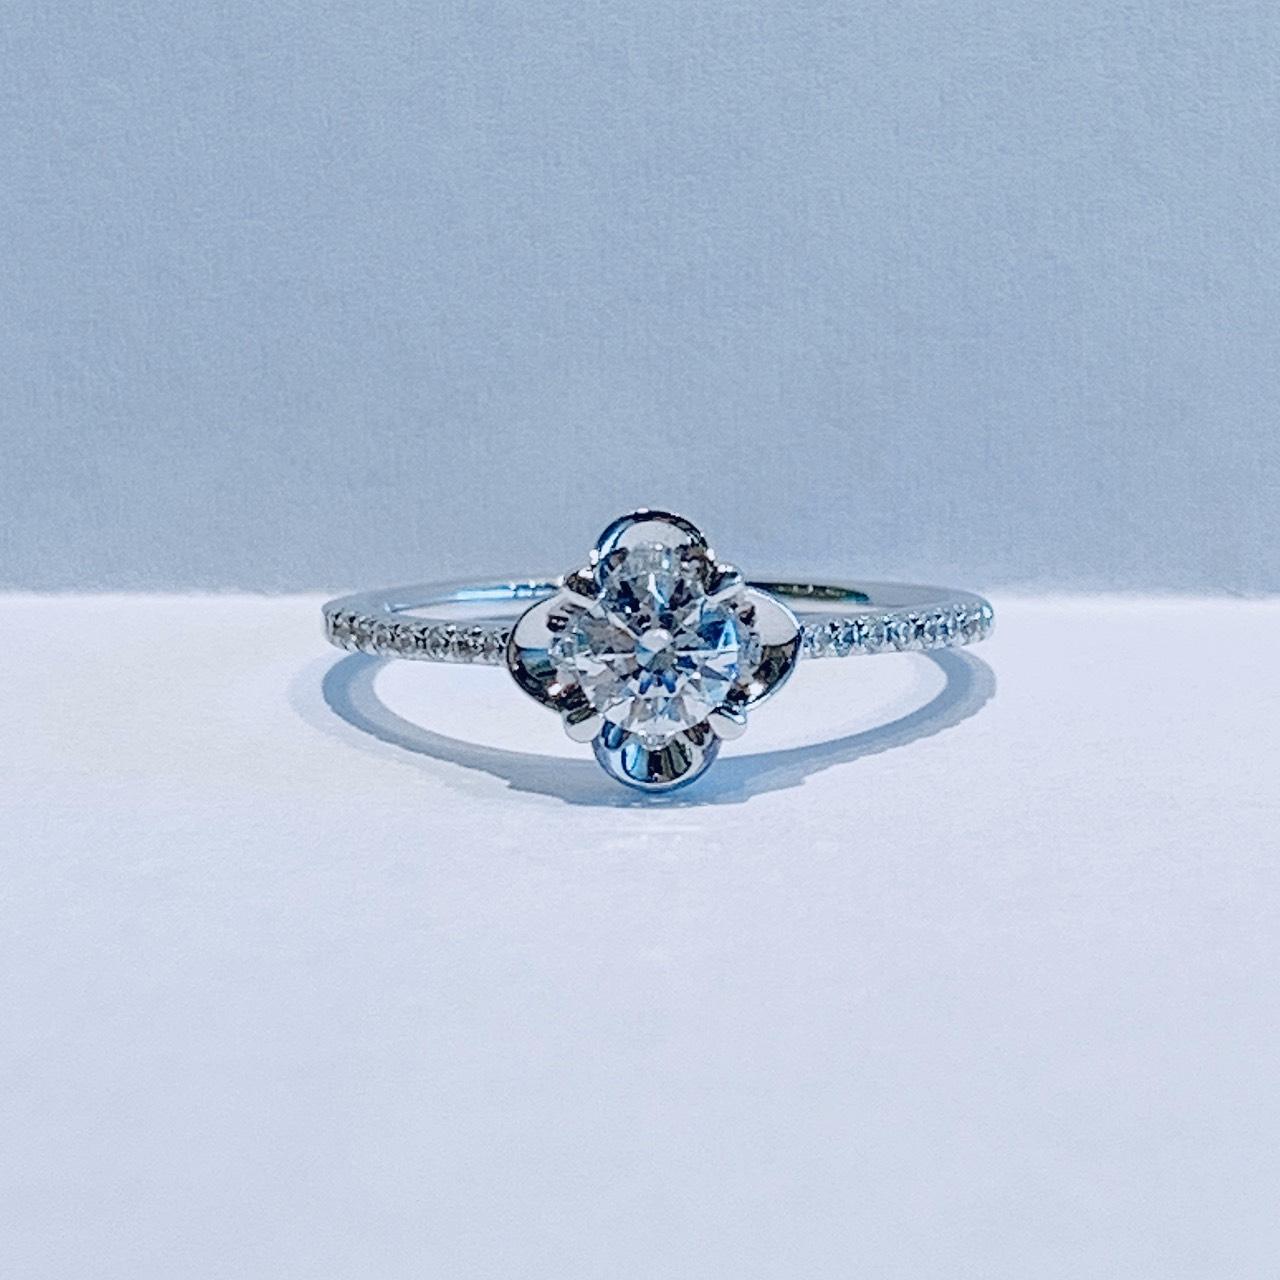 BROOCH 婚約指輪 エンゲージリング フラワーデザイン